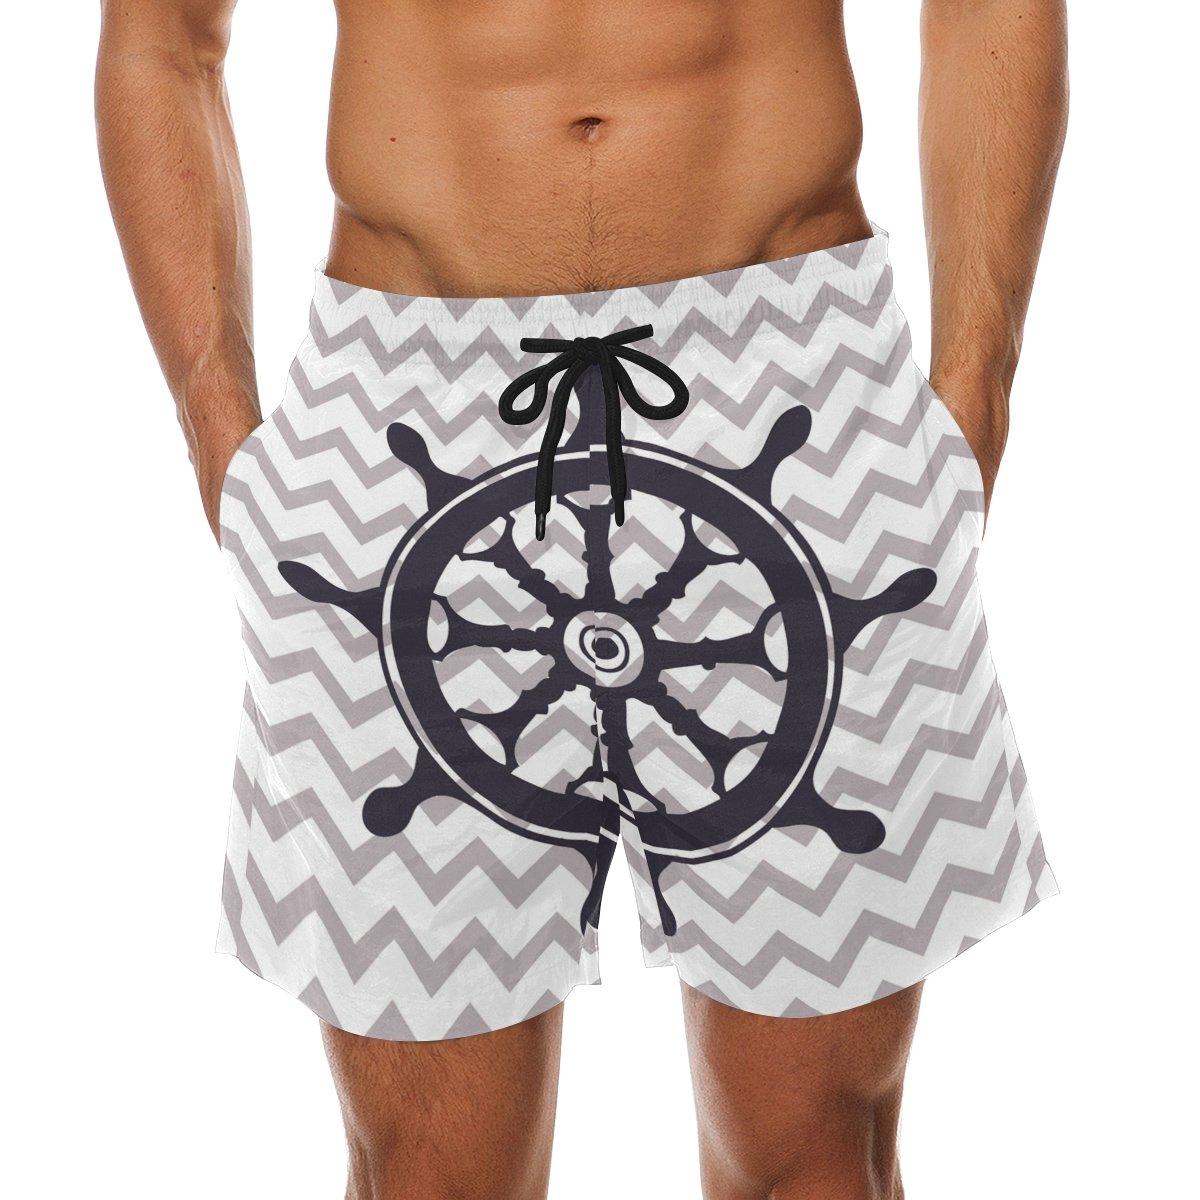 LORVIES Mens Nautical Rudder Beach Board Shorts Quick Dry Swim Trunk